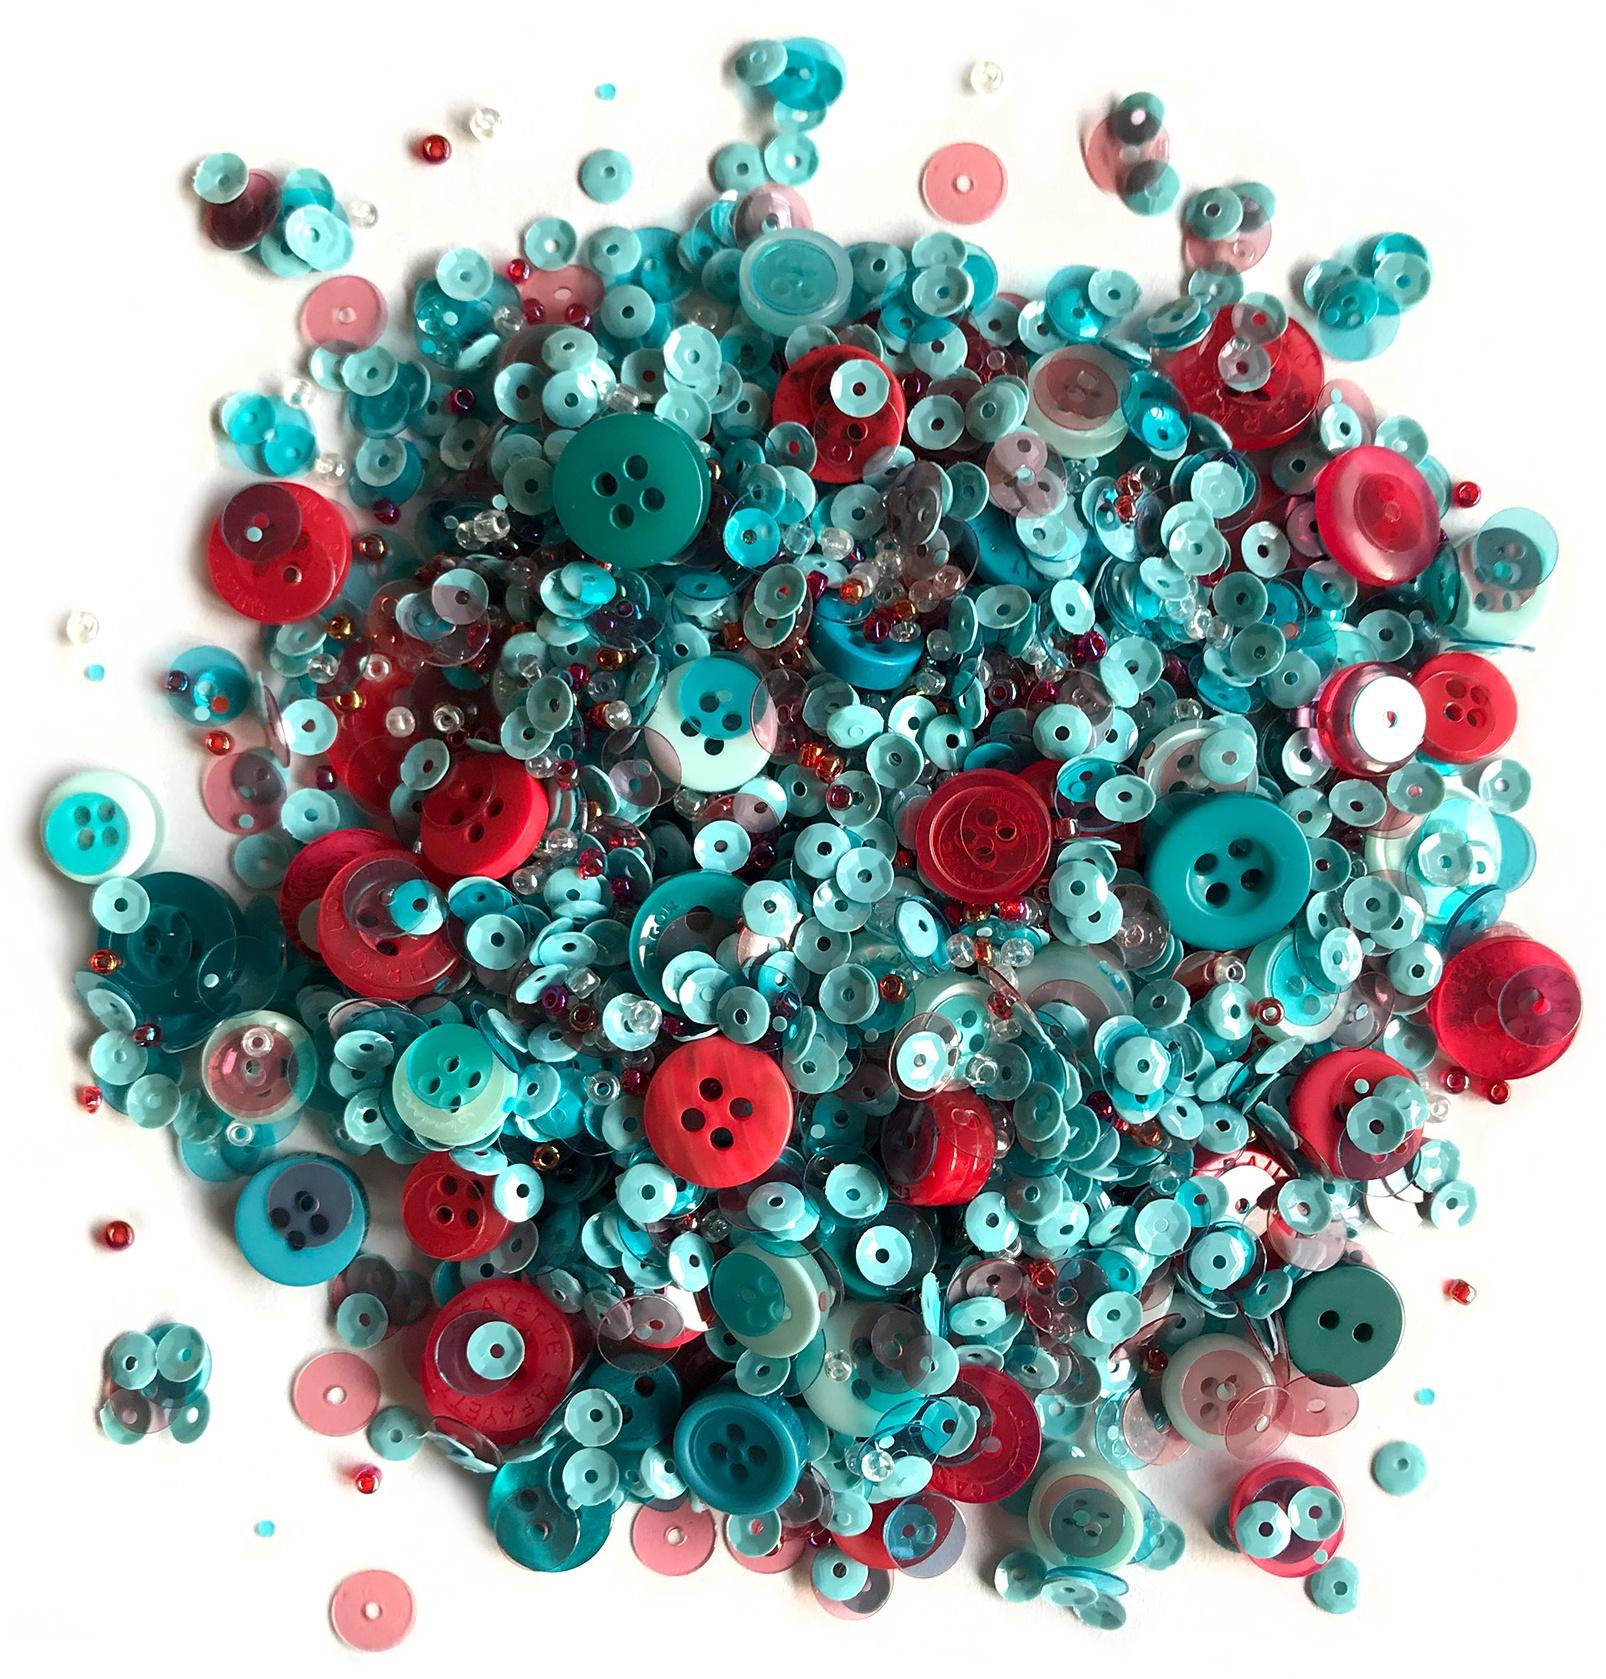 28 Lilac Lane Shaker Mix 65g-Ann's Quilt